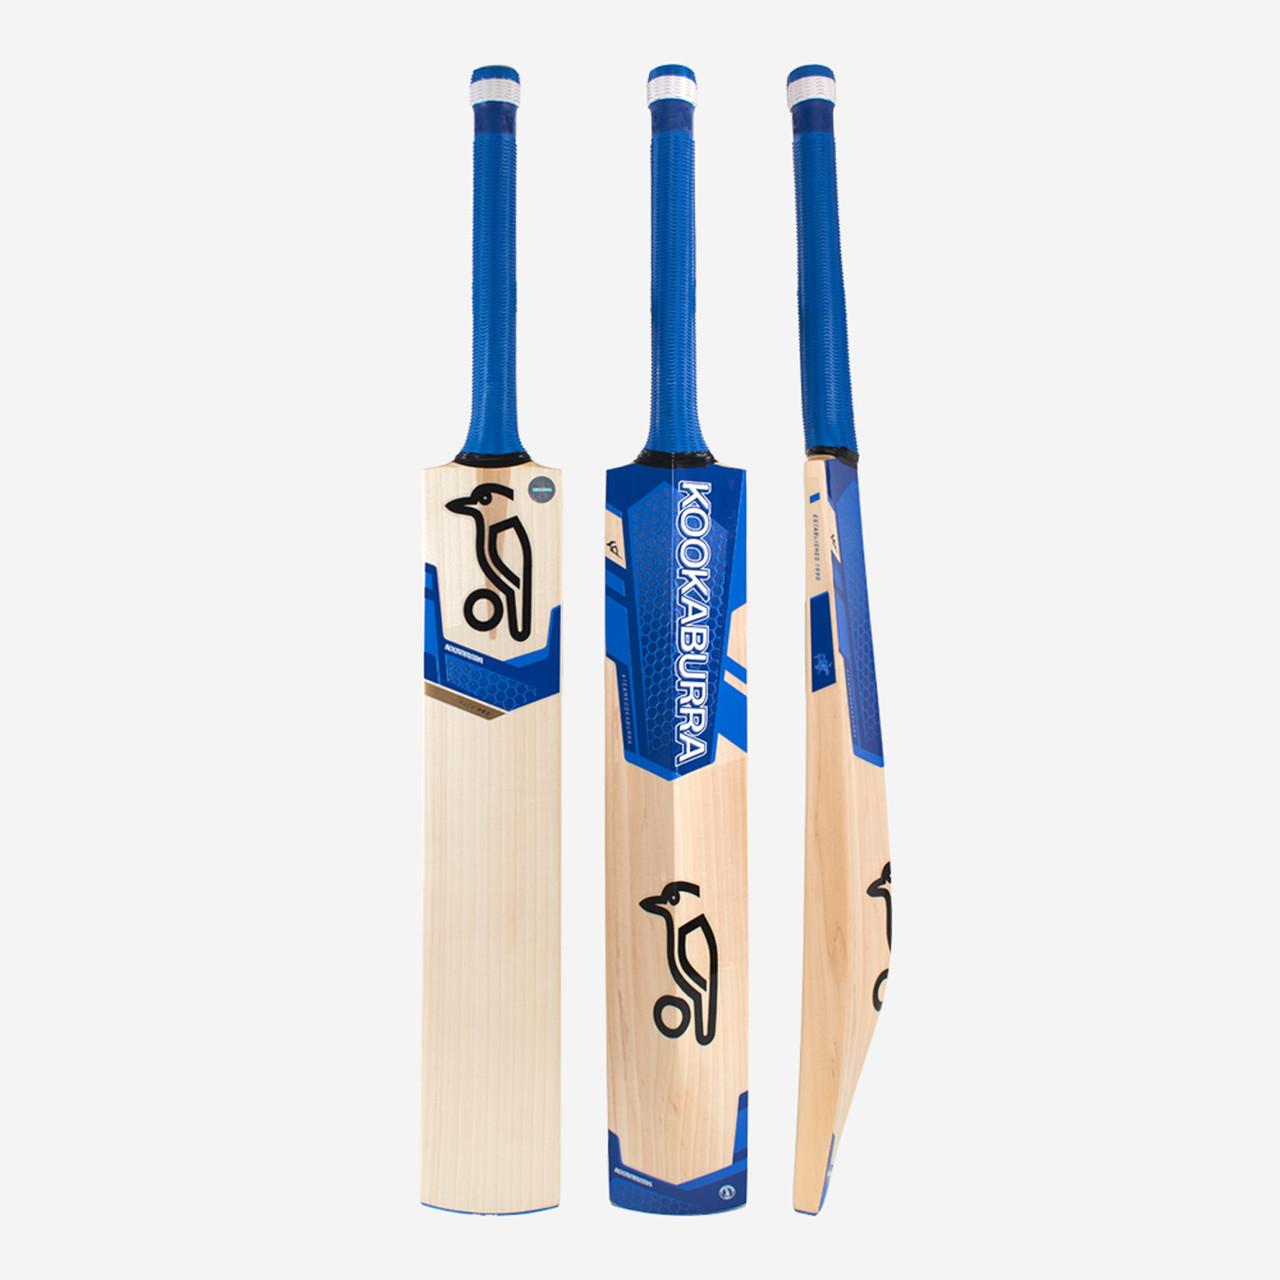 Kookaburra Pace Cricket Bat 2021